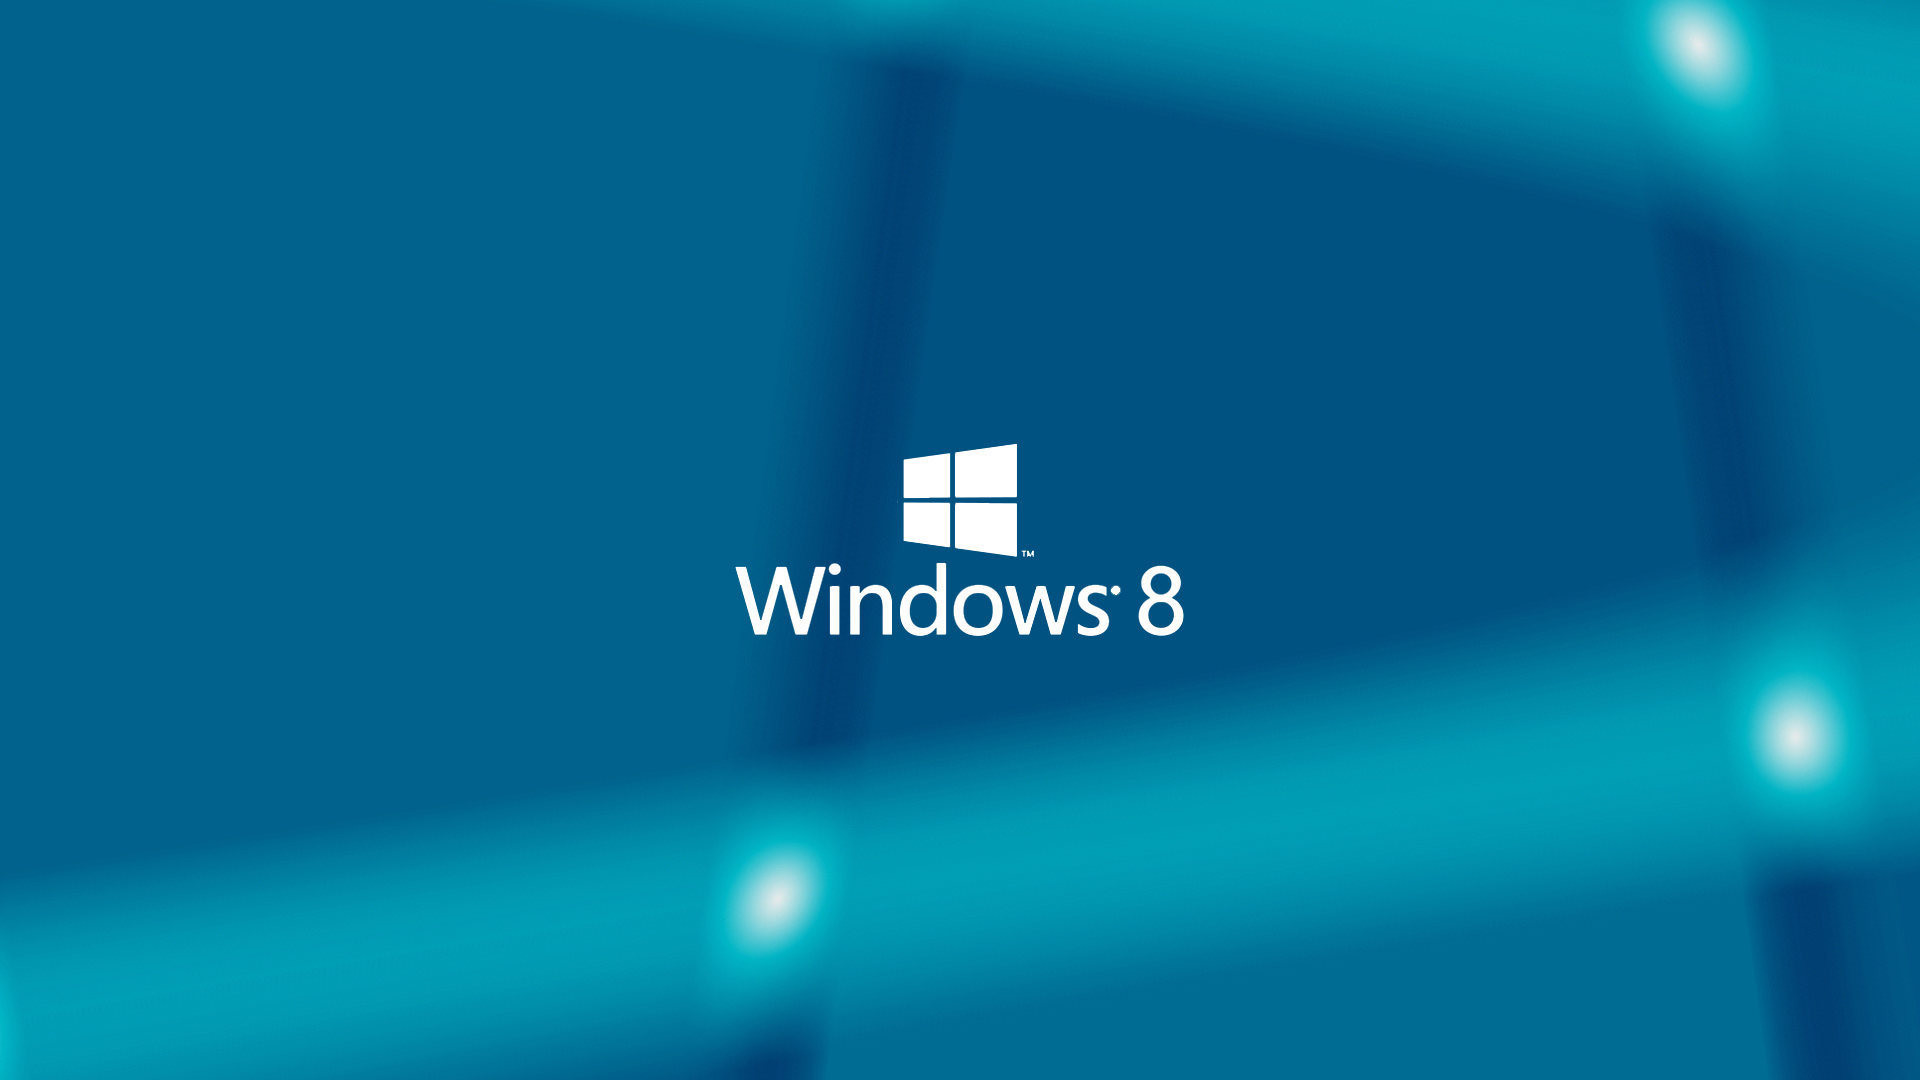 Wallpapers For Windows 8 Desktop 72 Images